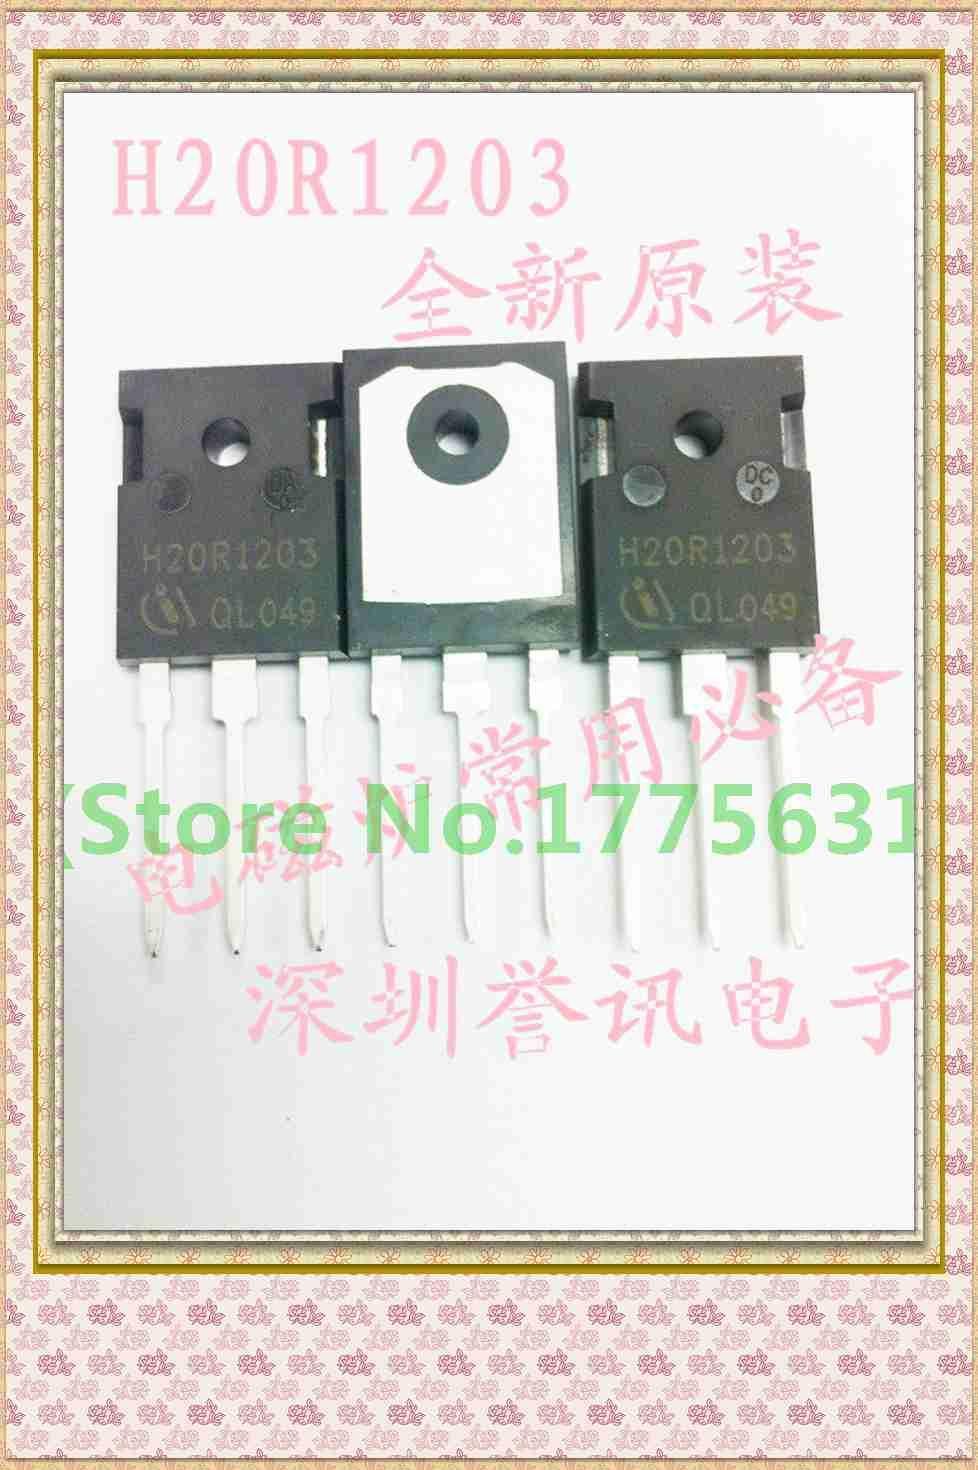 H20R1203 IGBT/20A1200V (5 шт /лот) | cash-back pw